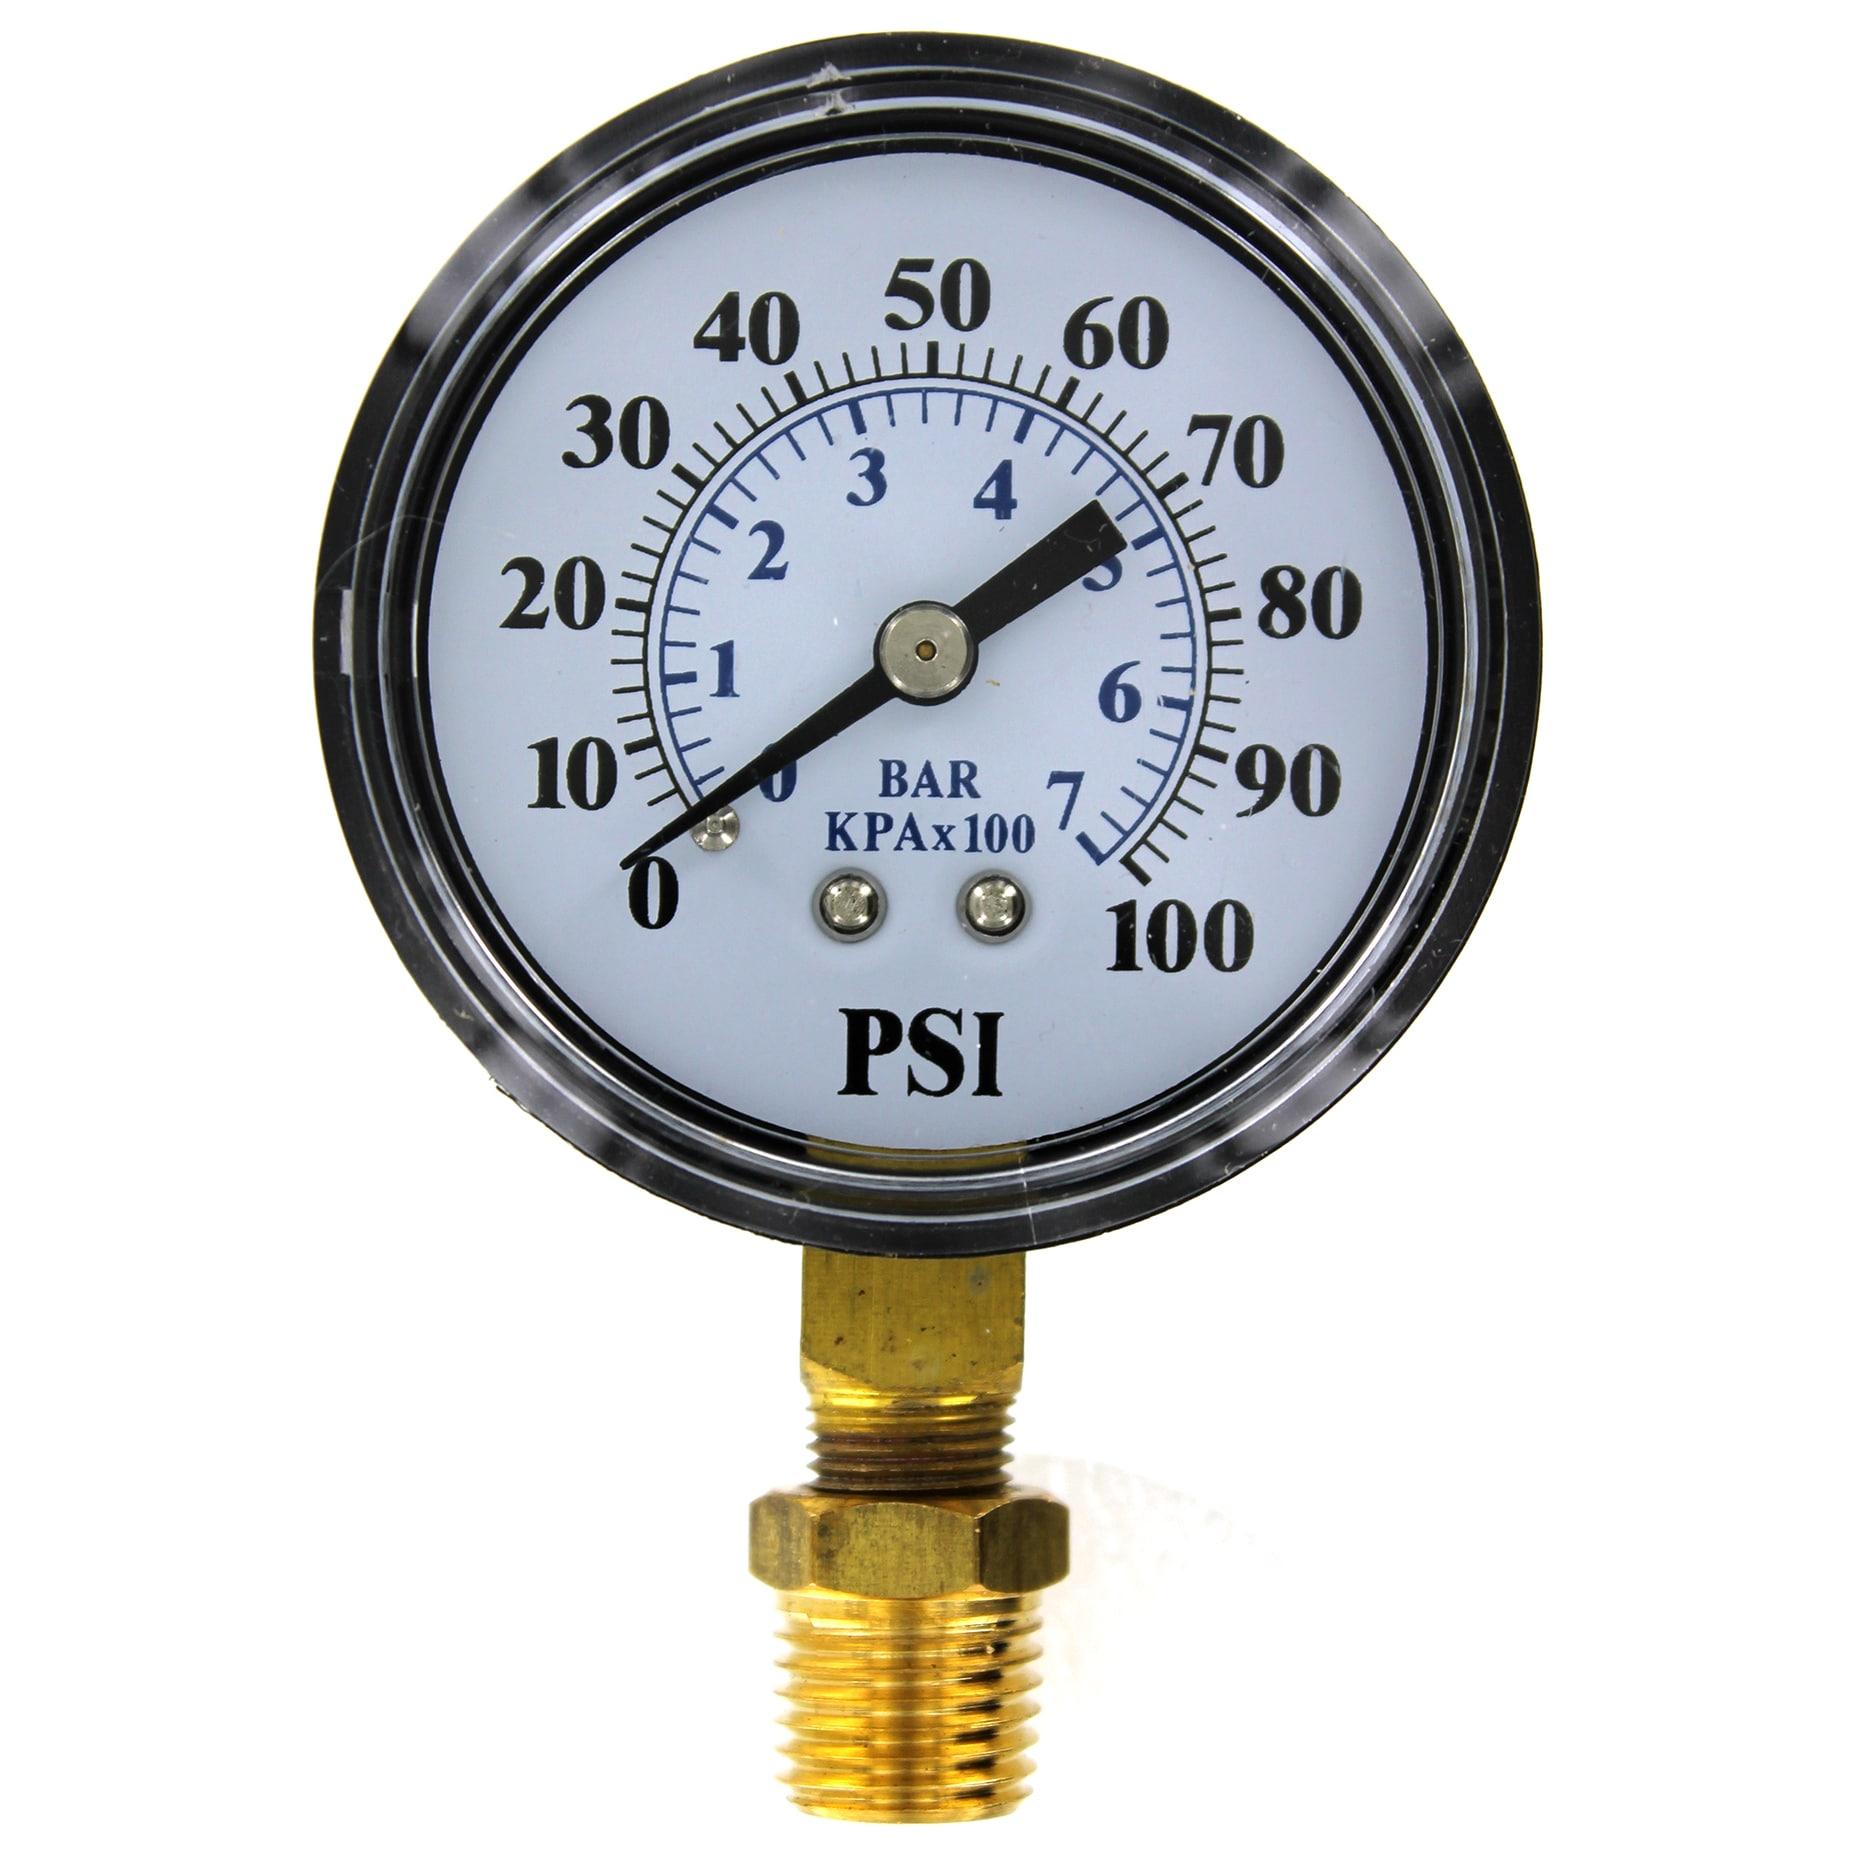 Pentair Parts 2 O TC2104-P2 Well Pump Pressure Gauge (Gau...